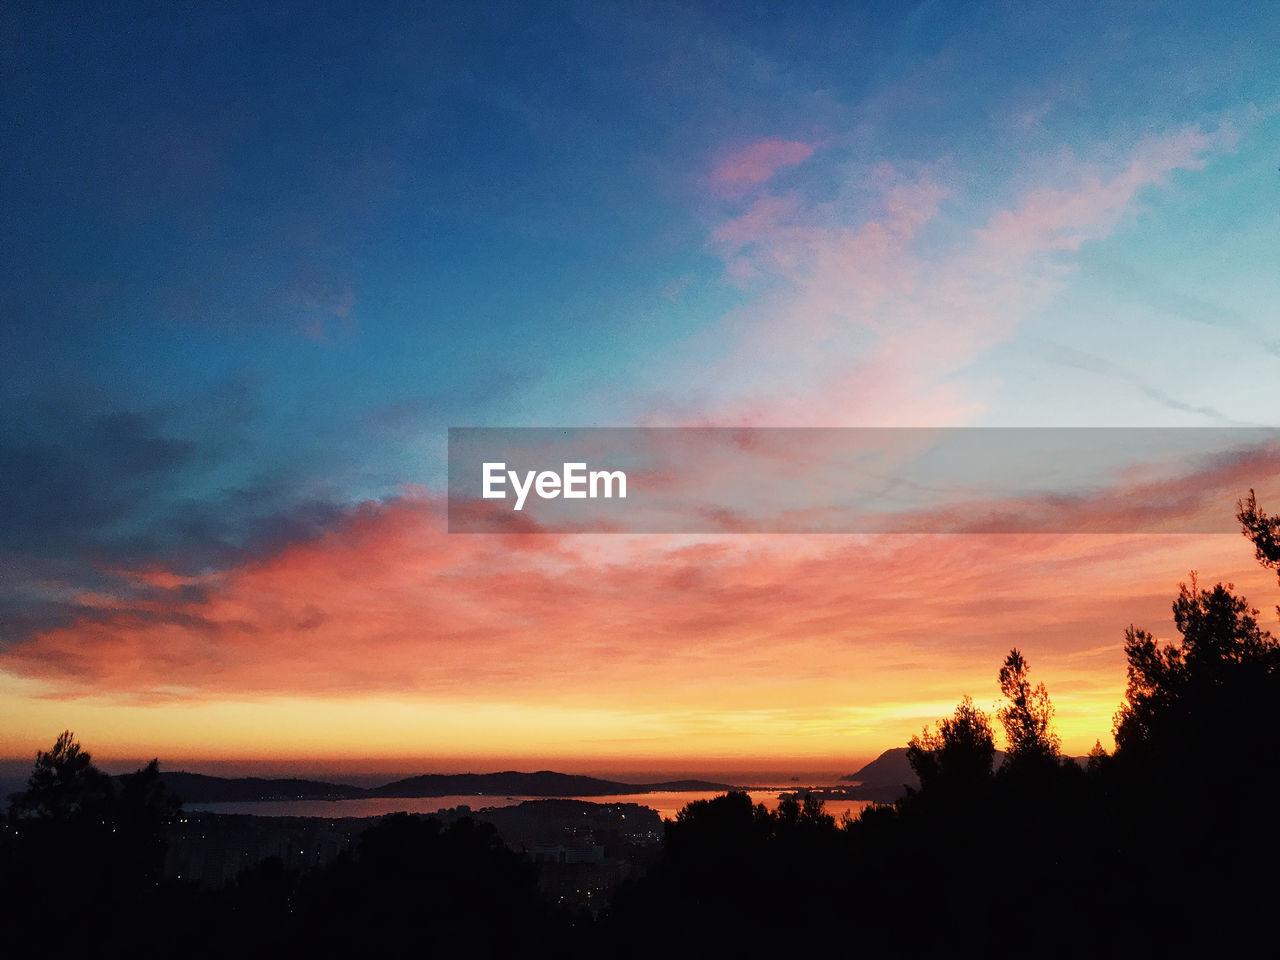 SCENIC VIEW OF SILHOUETTE LANDSCAPE AGAINST ROMANTIC SKY